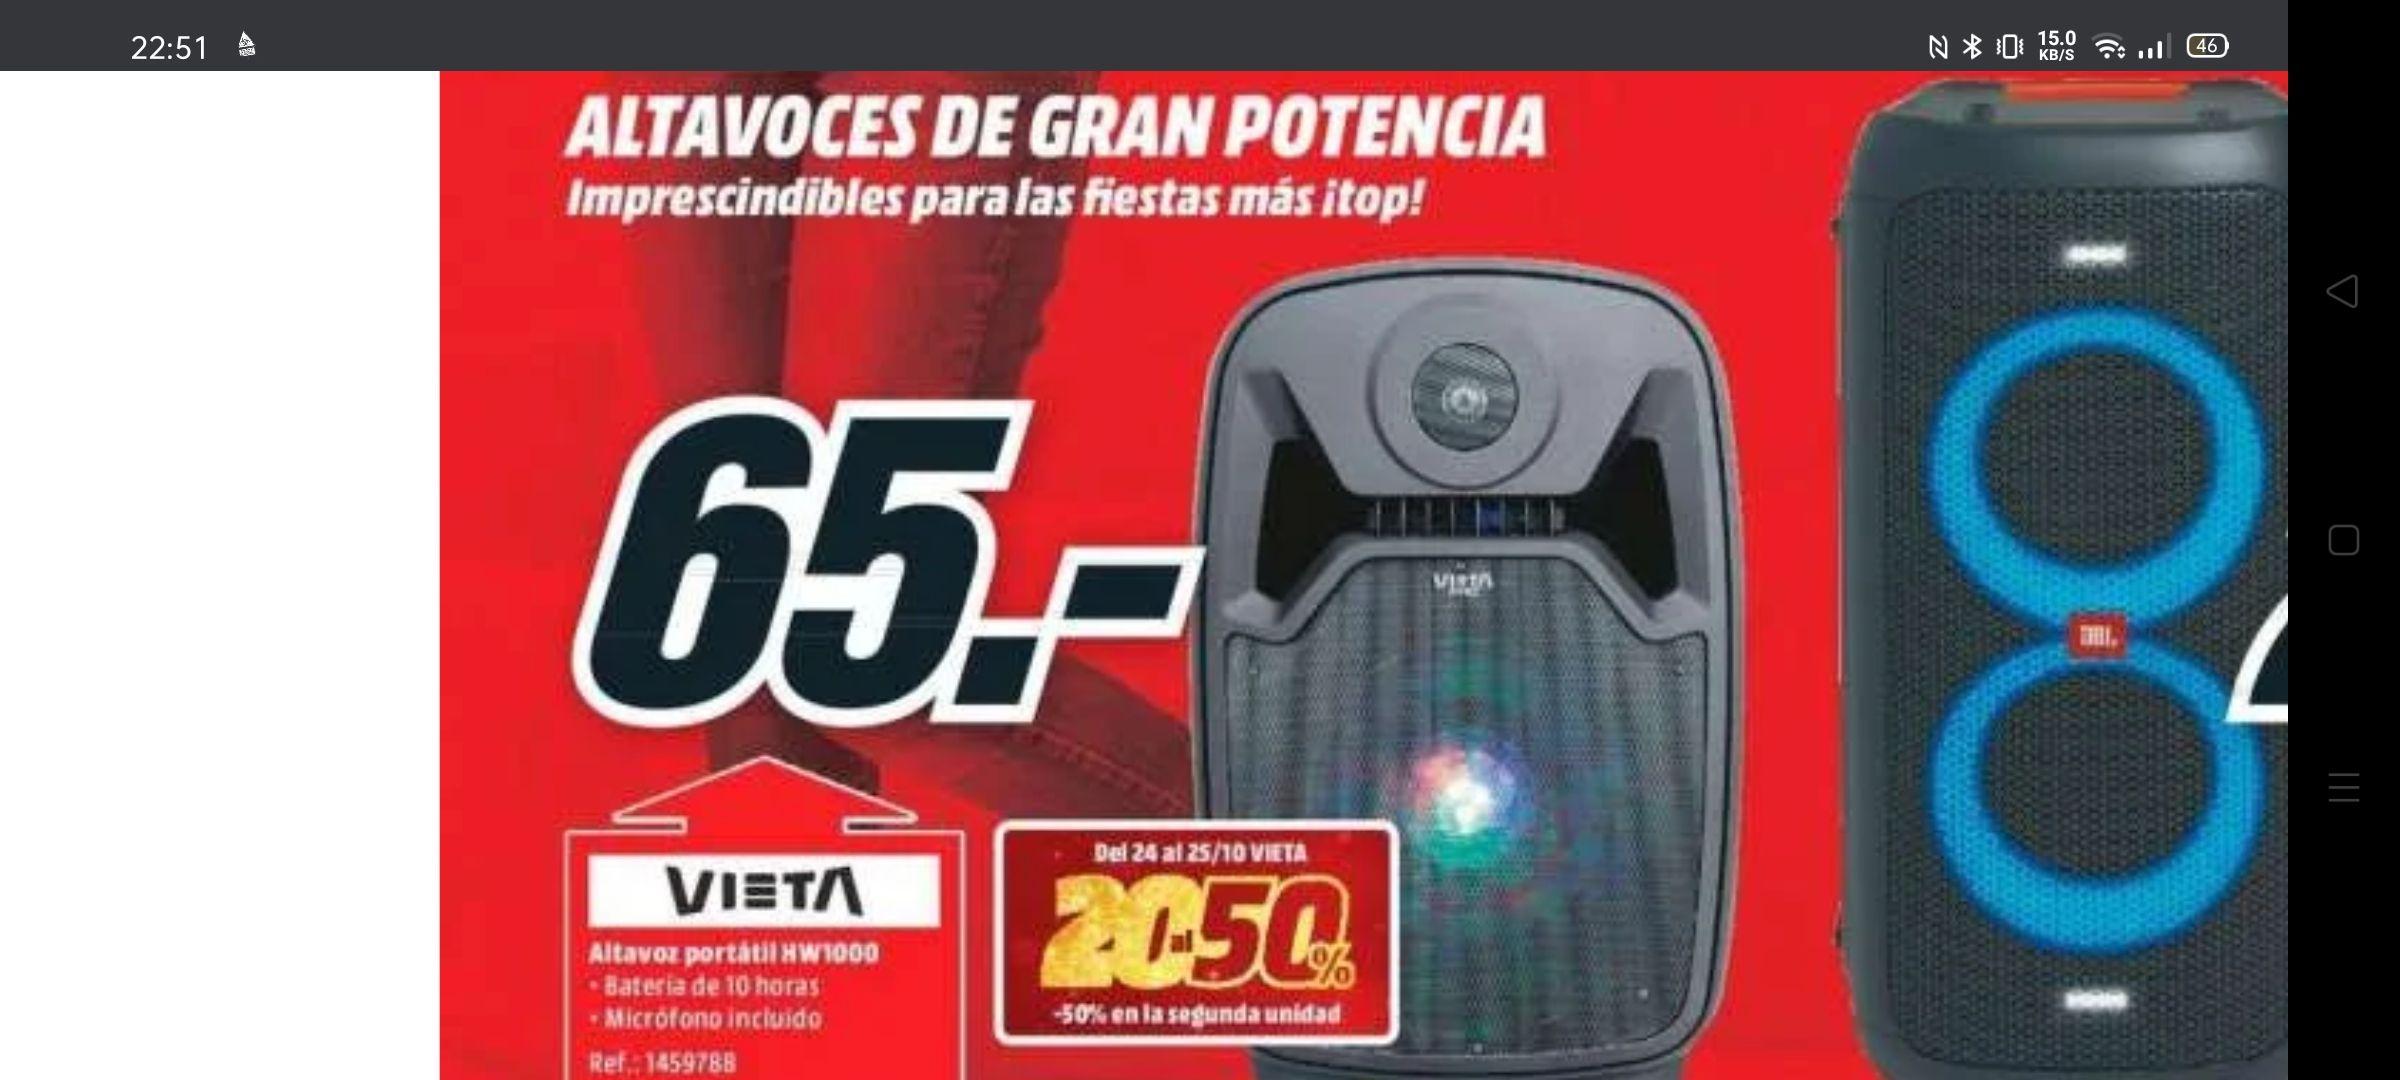 3192003-1EudS.jpg